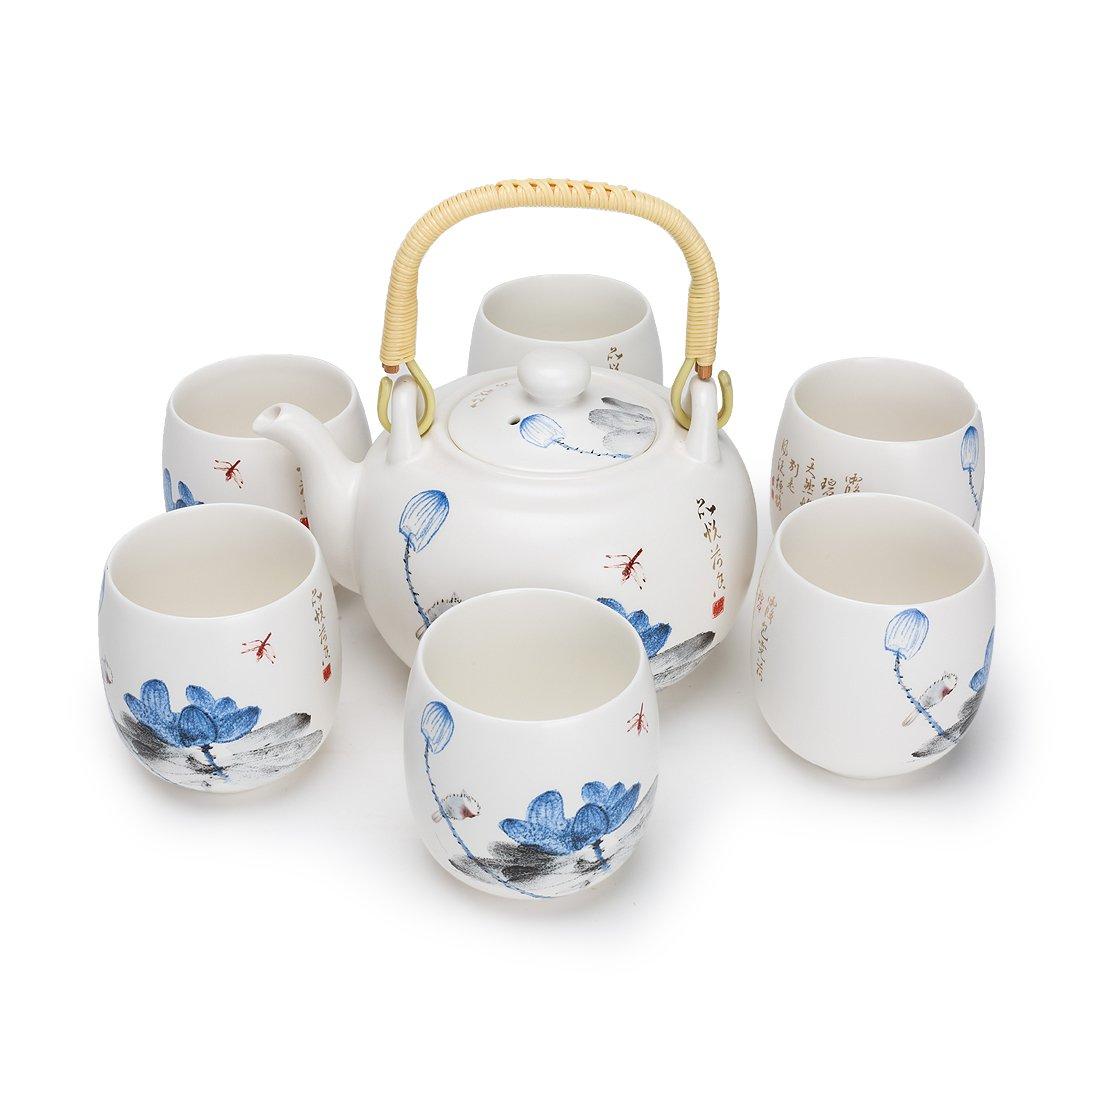 FORLONG Vintage Chinese Style Porcelain Handmade Kung Fu Tea Set with tea pot,tea cups 7-pack